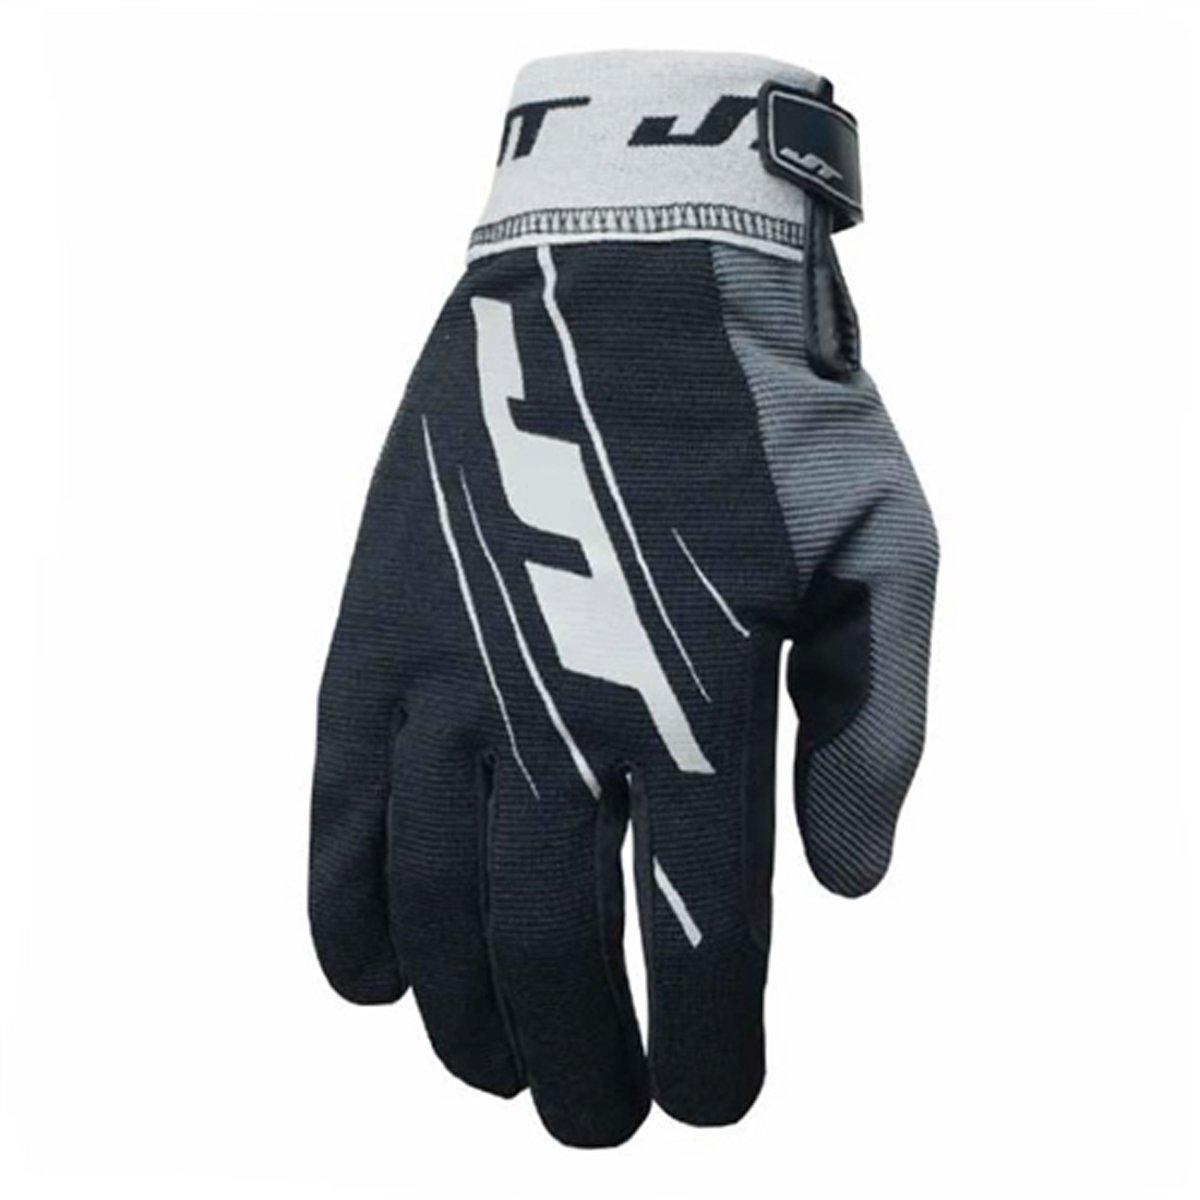 JT Tournament Paintball Gloves - Black - Large